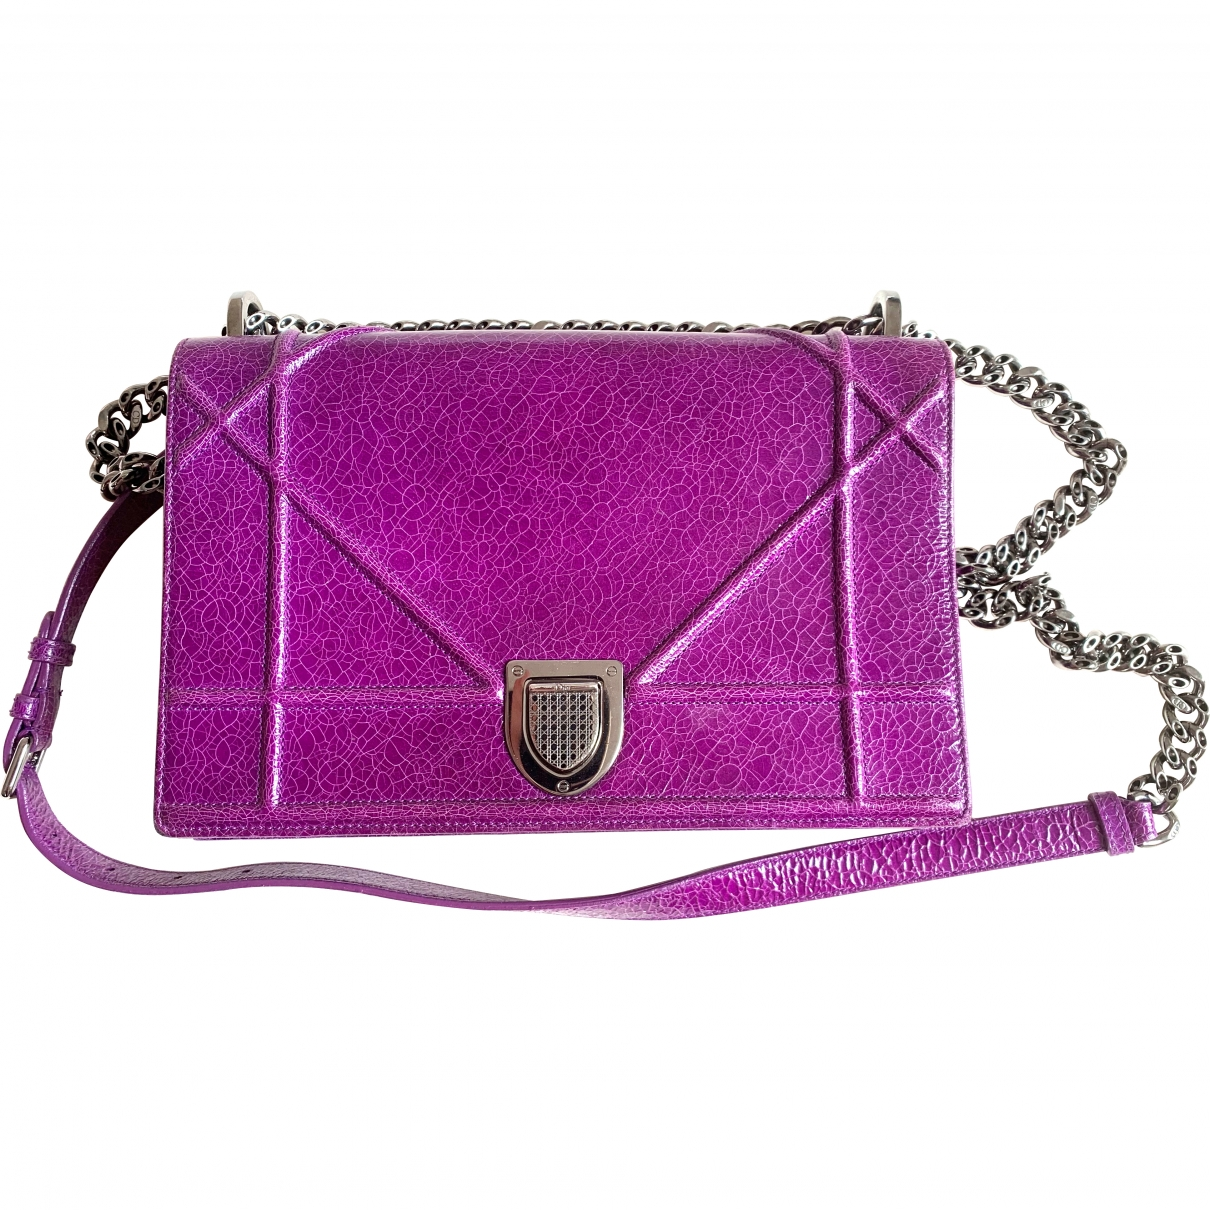 Dior Diorama Purple Patent leather handbag for Women \N